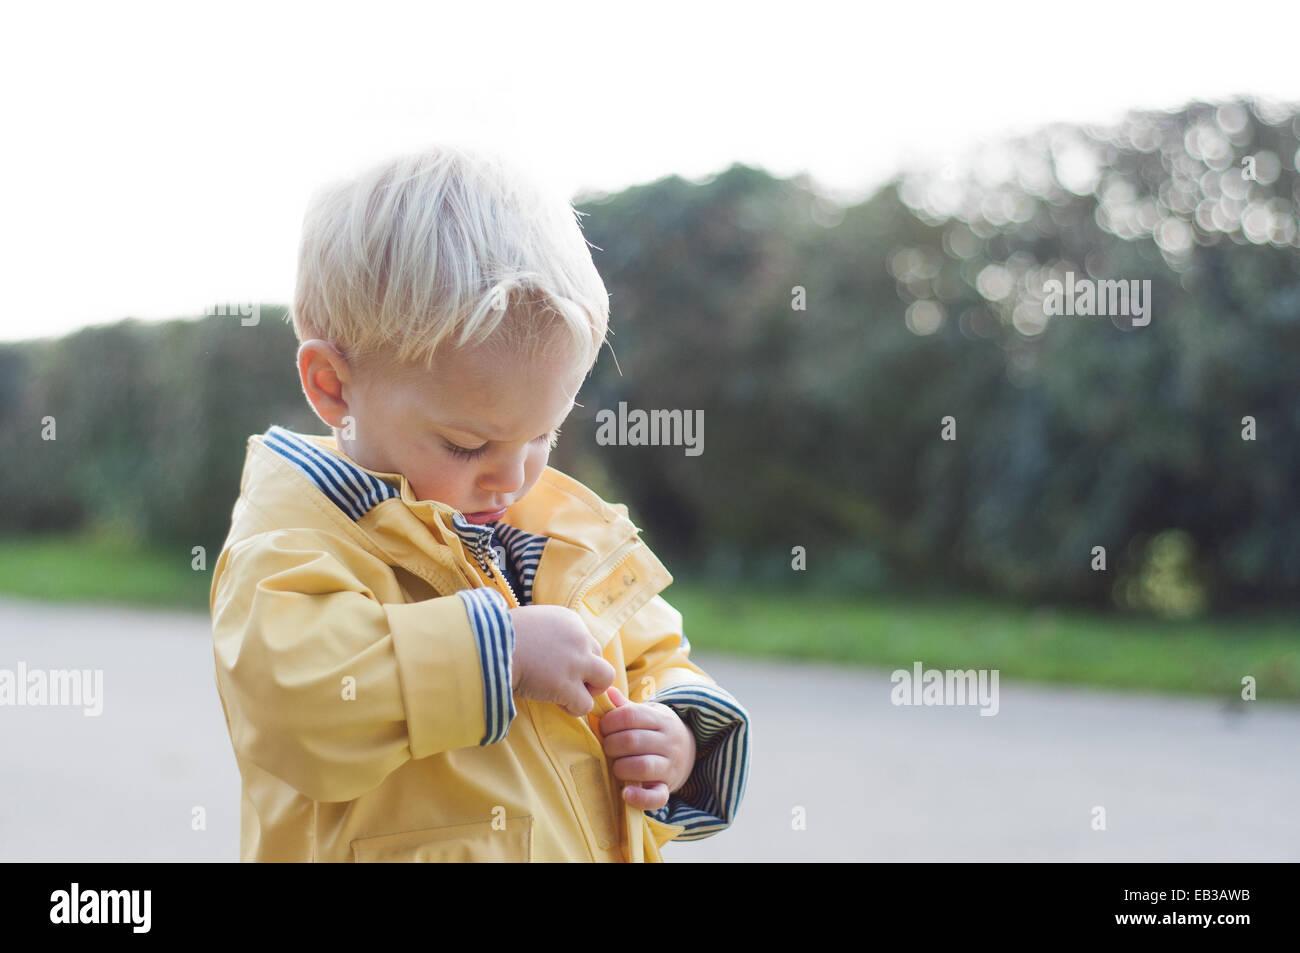 Boy zipping up rain coat - Stock Image